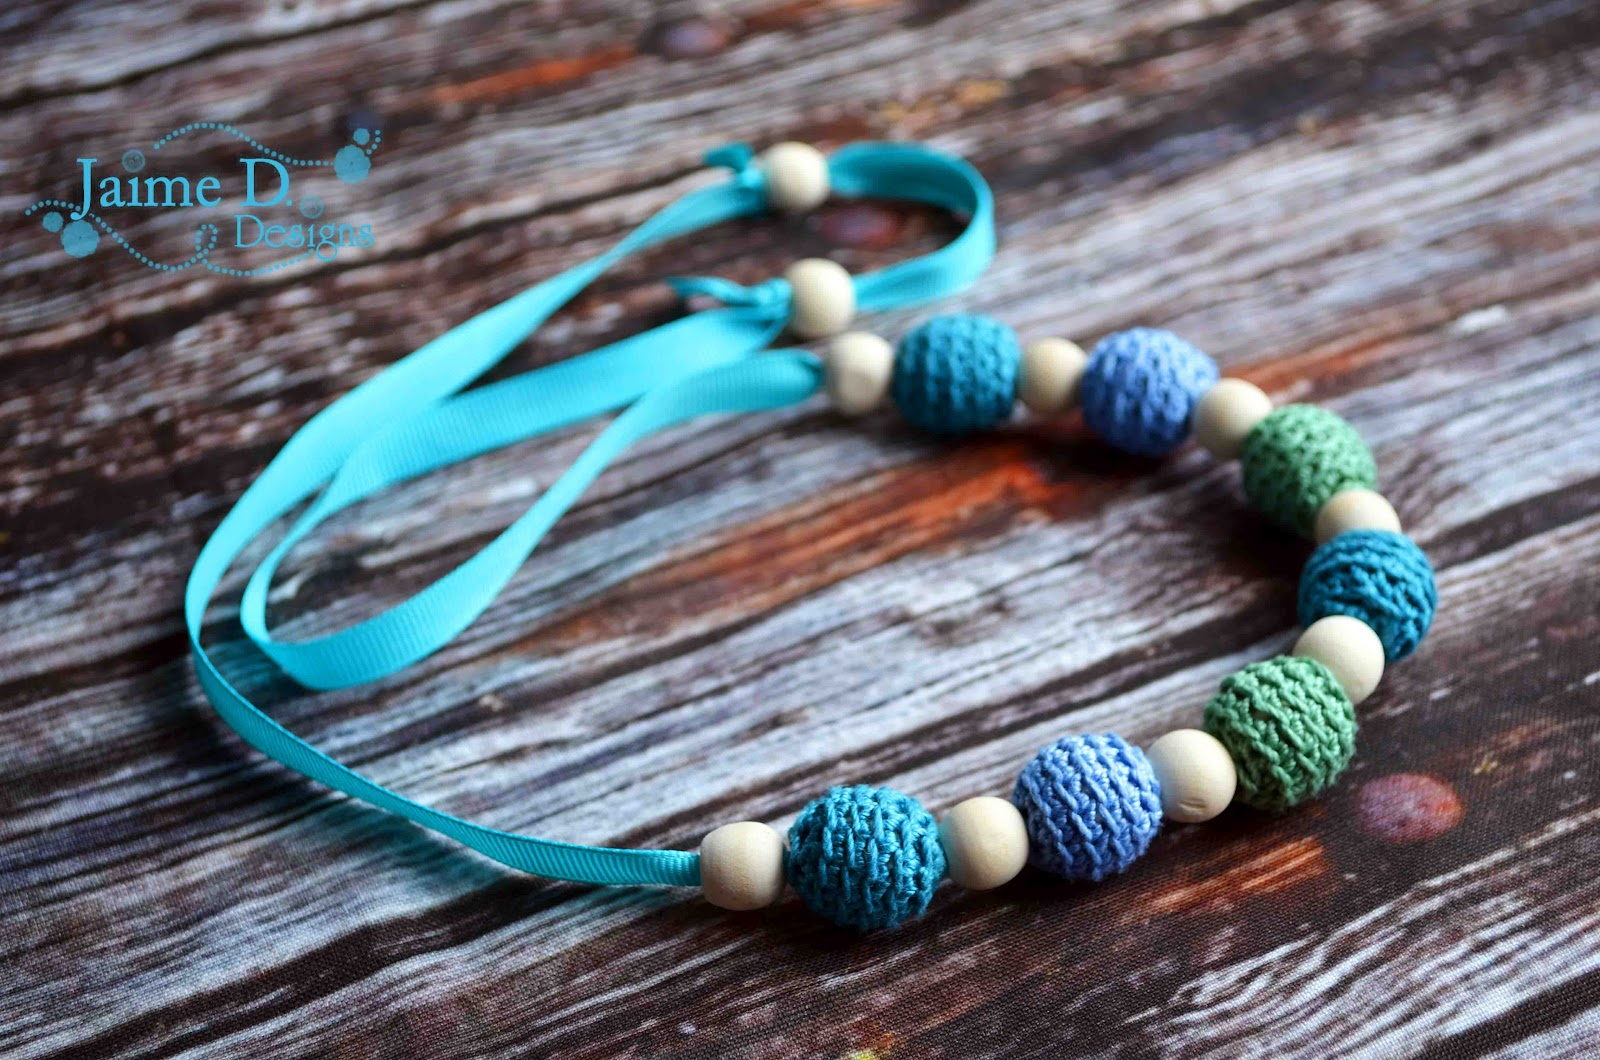 Jaime D. Designs: Crocheted Teething Necklace